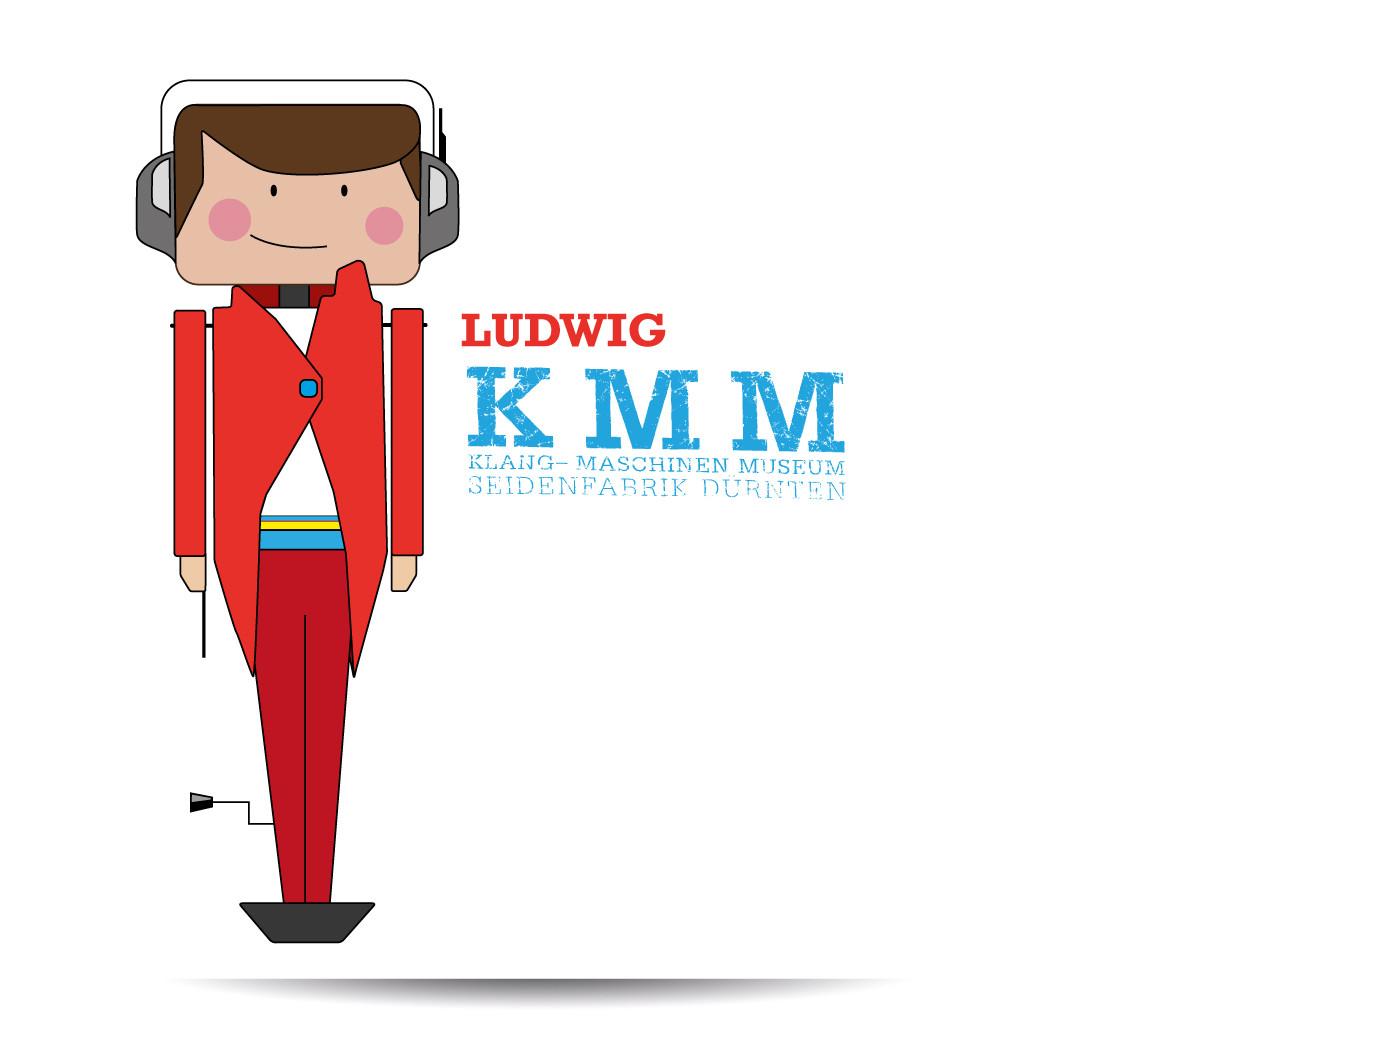 Ludwig_web.jpg